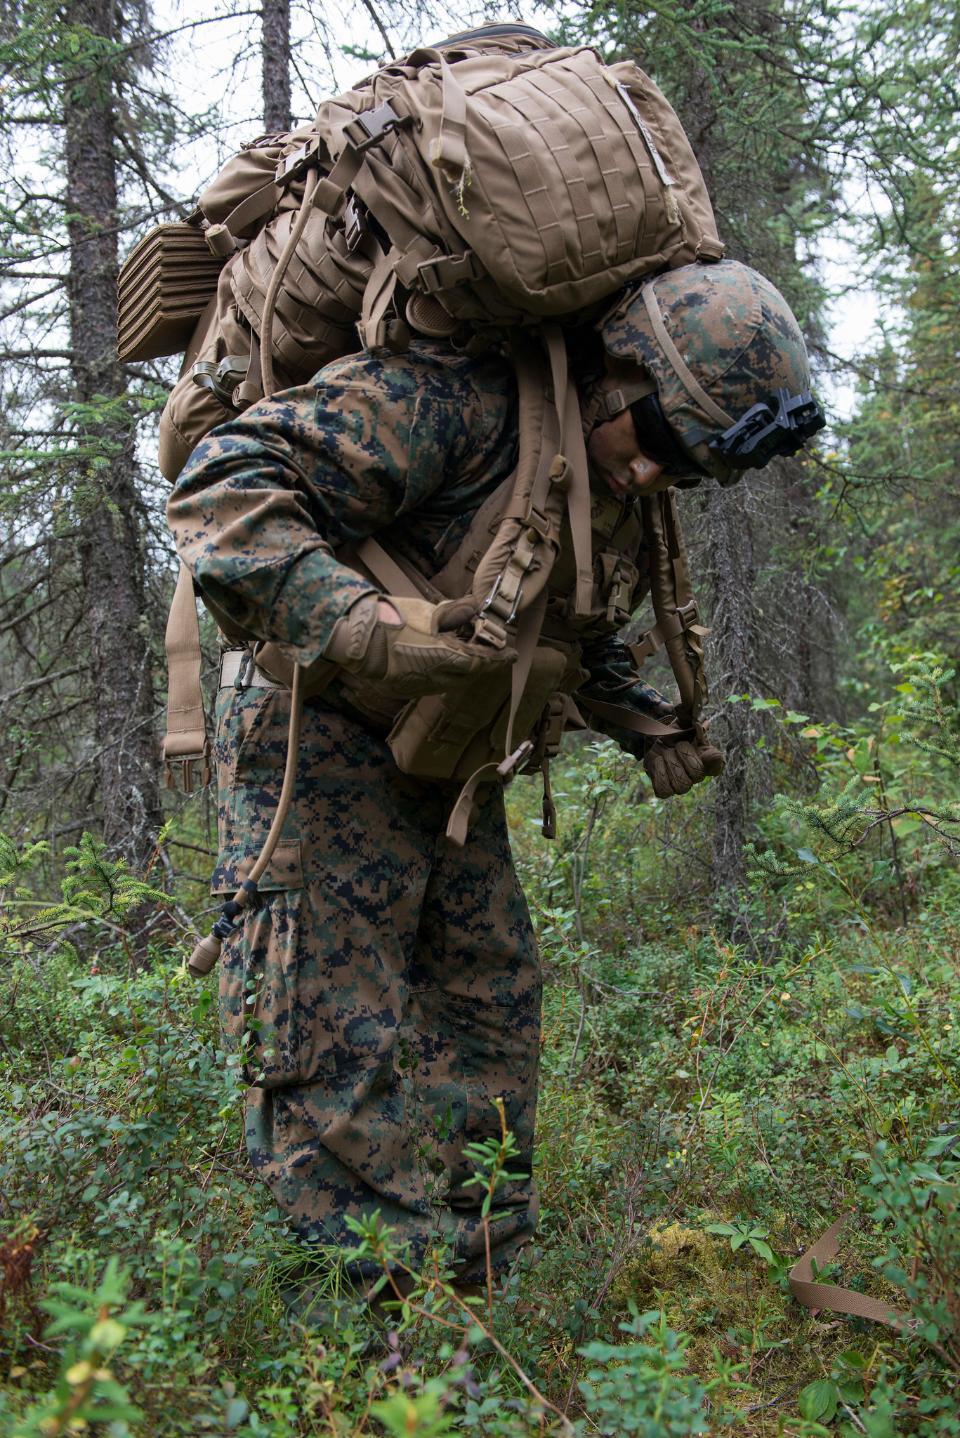 U.S. Marine Corps infantry riflemen